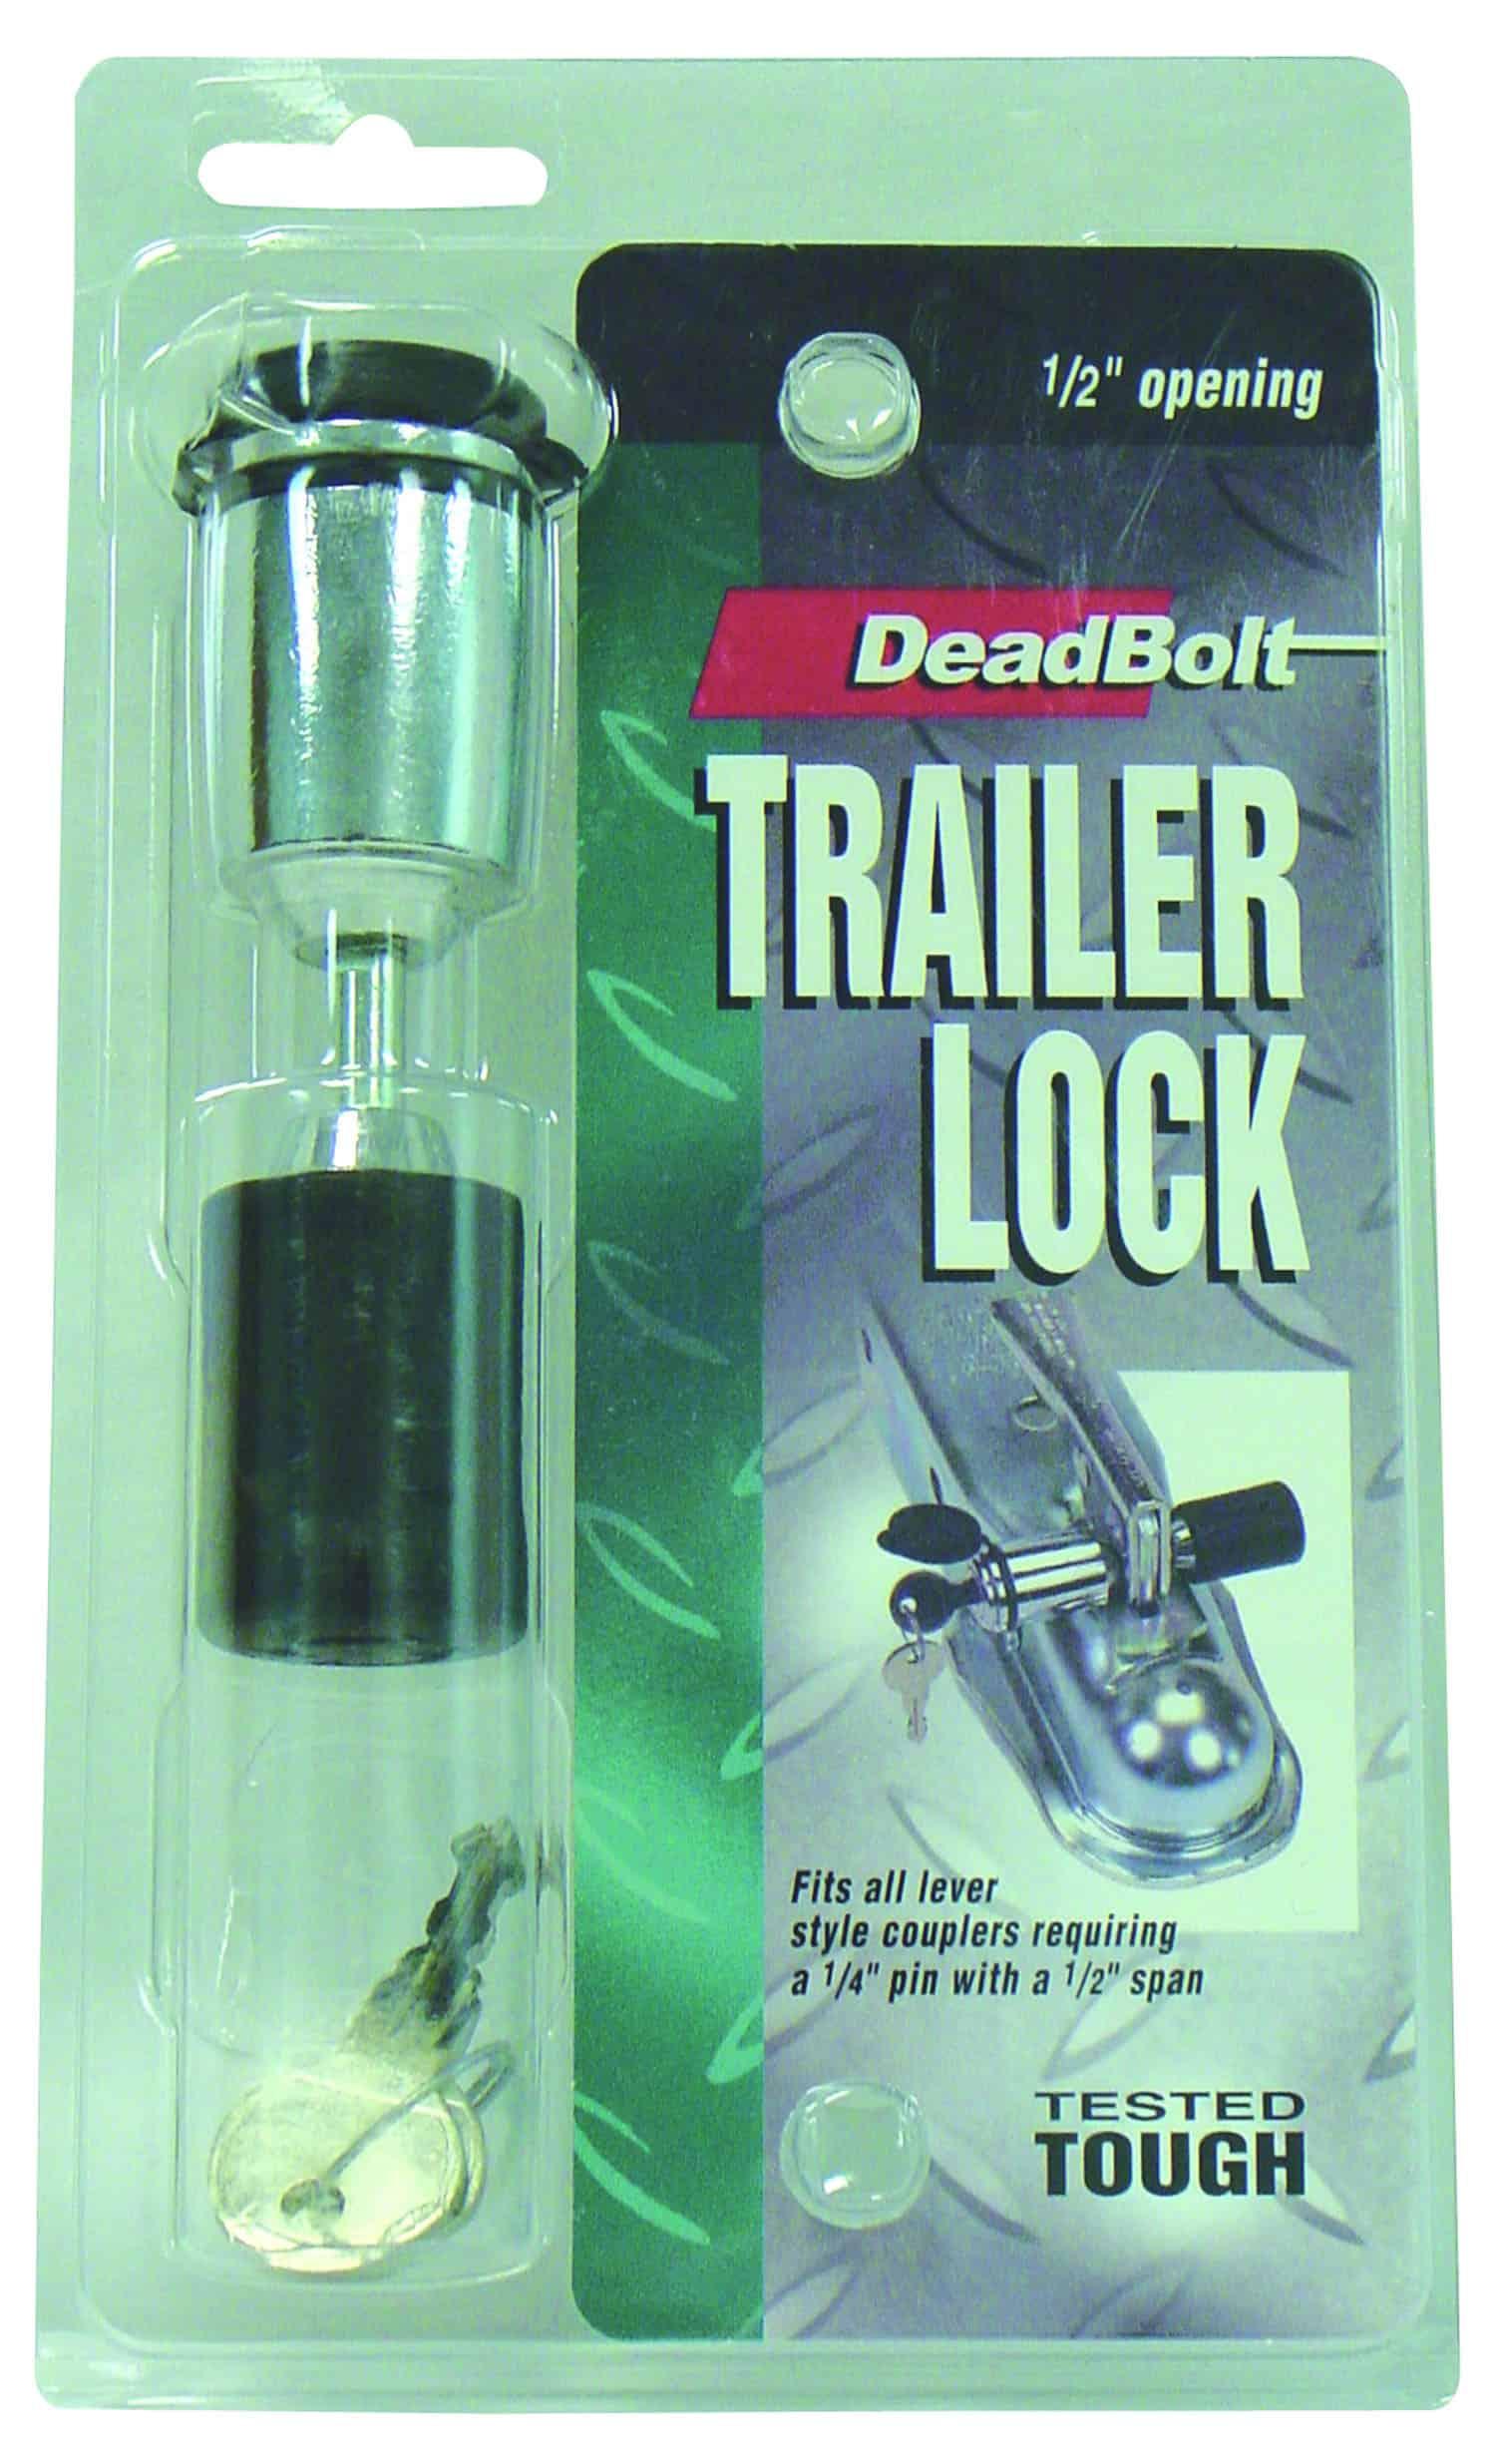 07230 - Trailer Hitch Lock